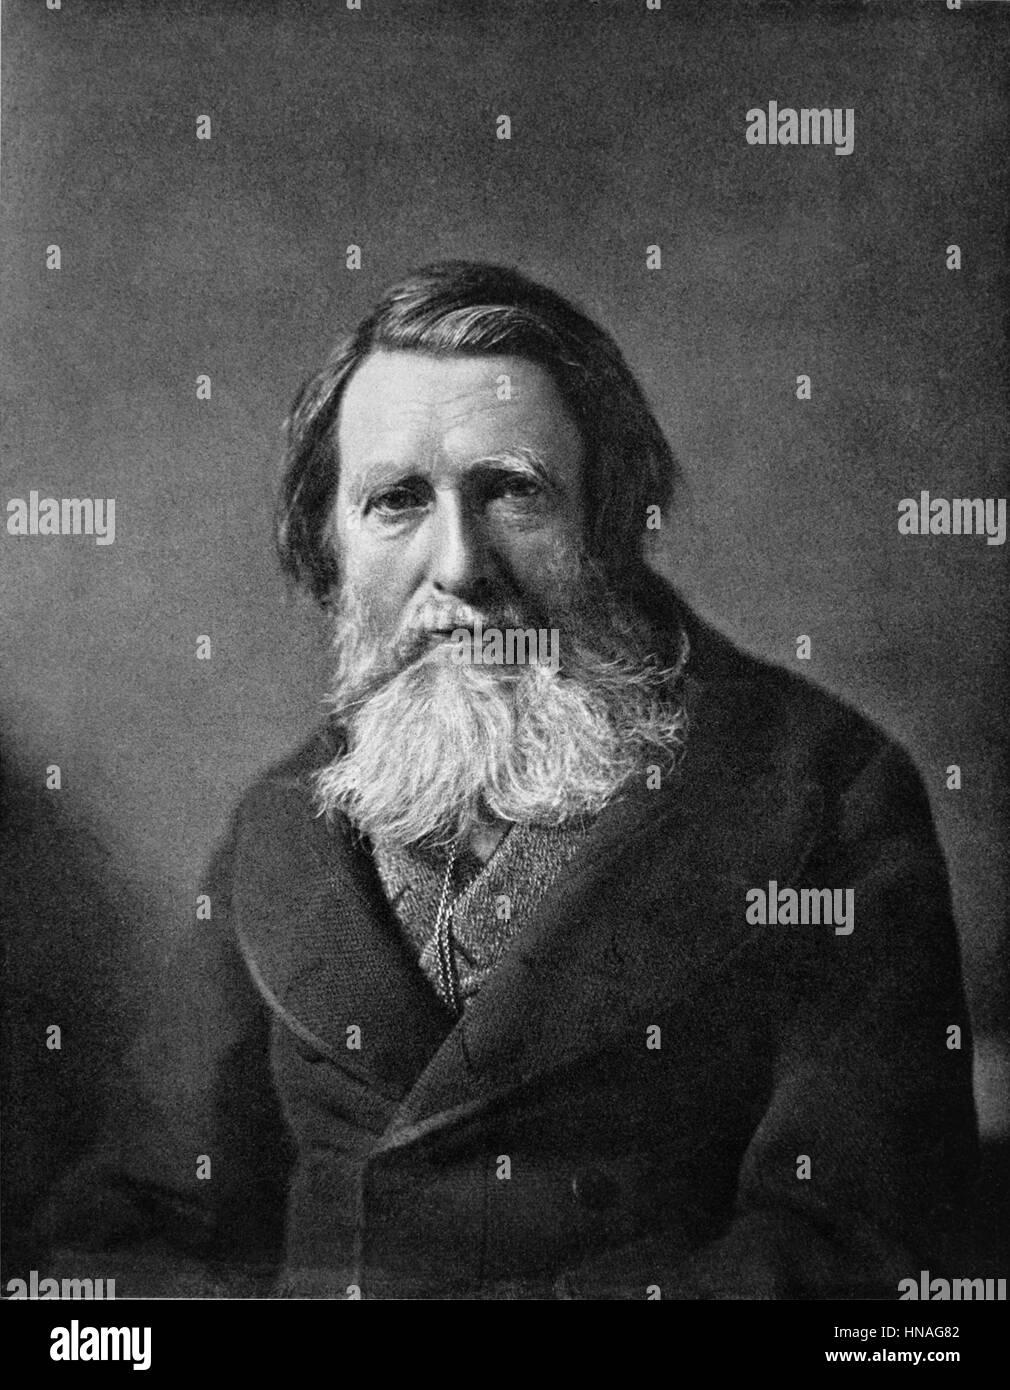 JOHN RUSKIN CRITICO D'ARTE & WRITER (1880) Immagini Stock